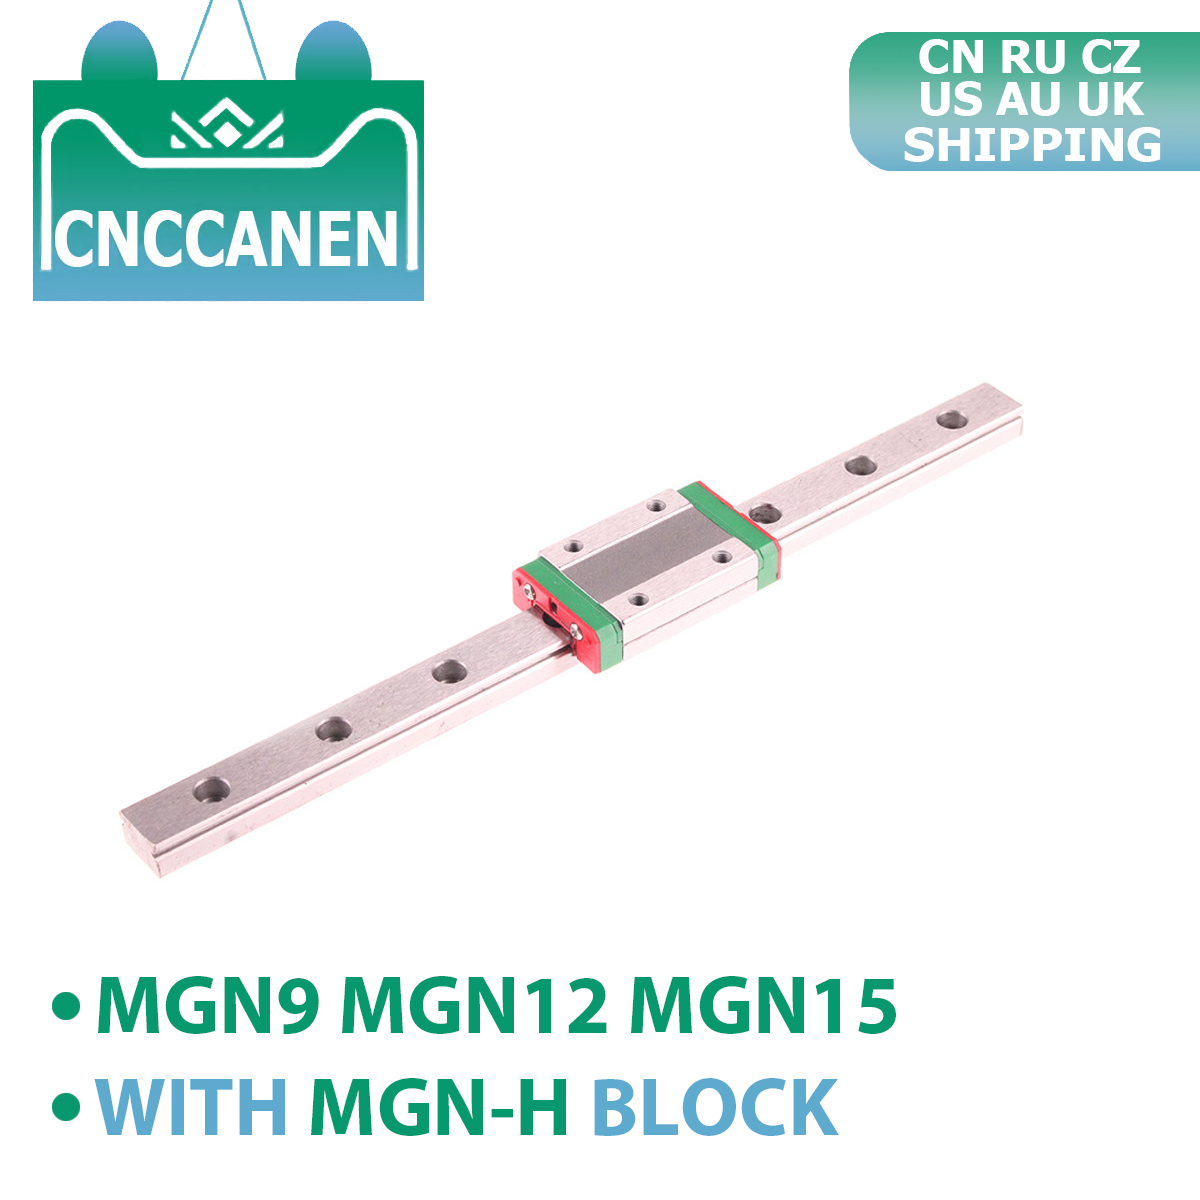 CNC 3D Printer MGN9 MGN12 MGN15 Miniature Linear Rail Slide 100 - 1000mm MGN Linear Guide + MGN9H MGN12H MGN15H Carriage Block